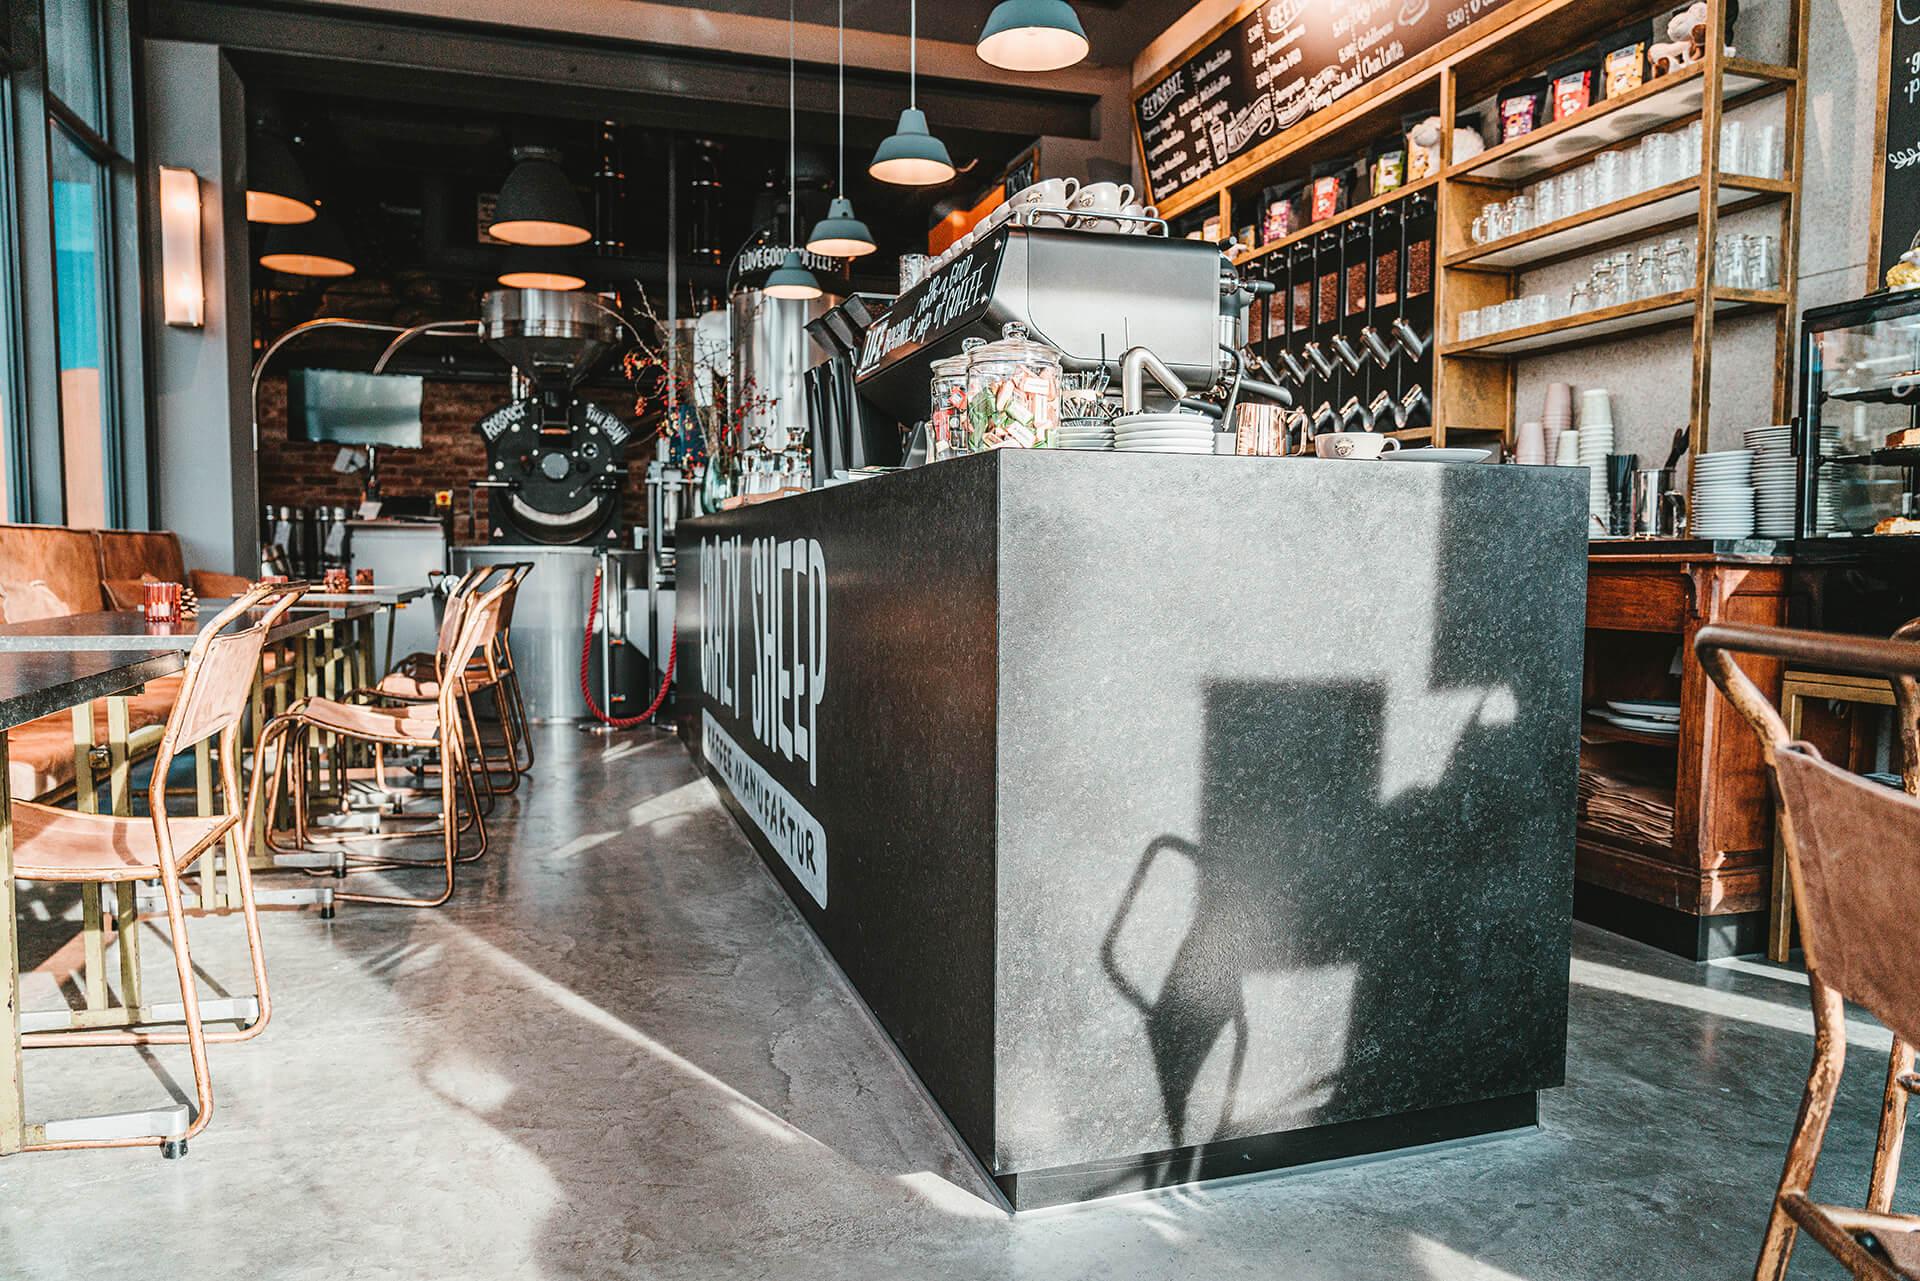 Natursteine Strobel - Crazy Sheep Kaffemanufaktur